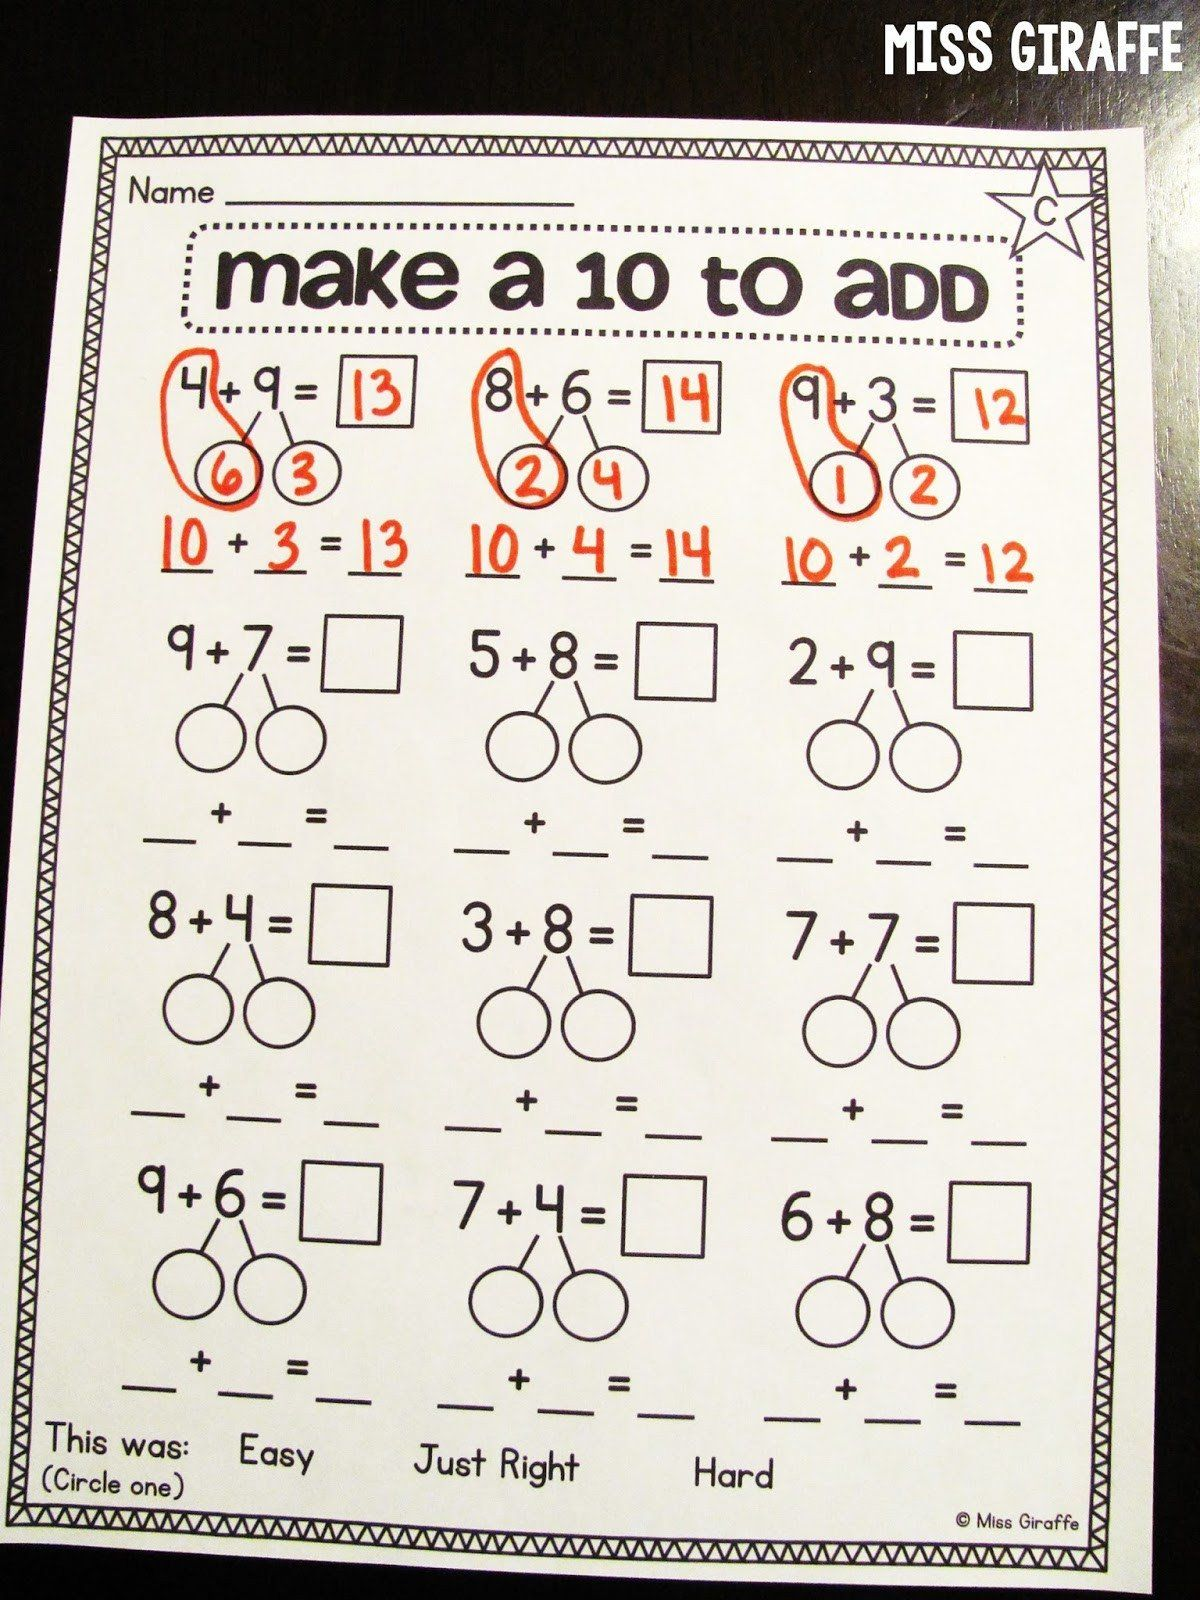 Decomposing Numbers Worksheet 1 10   Printable Worksheets and Activities  for Teachers [ 1600 x 1200 Pixel ]